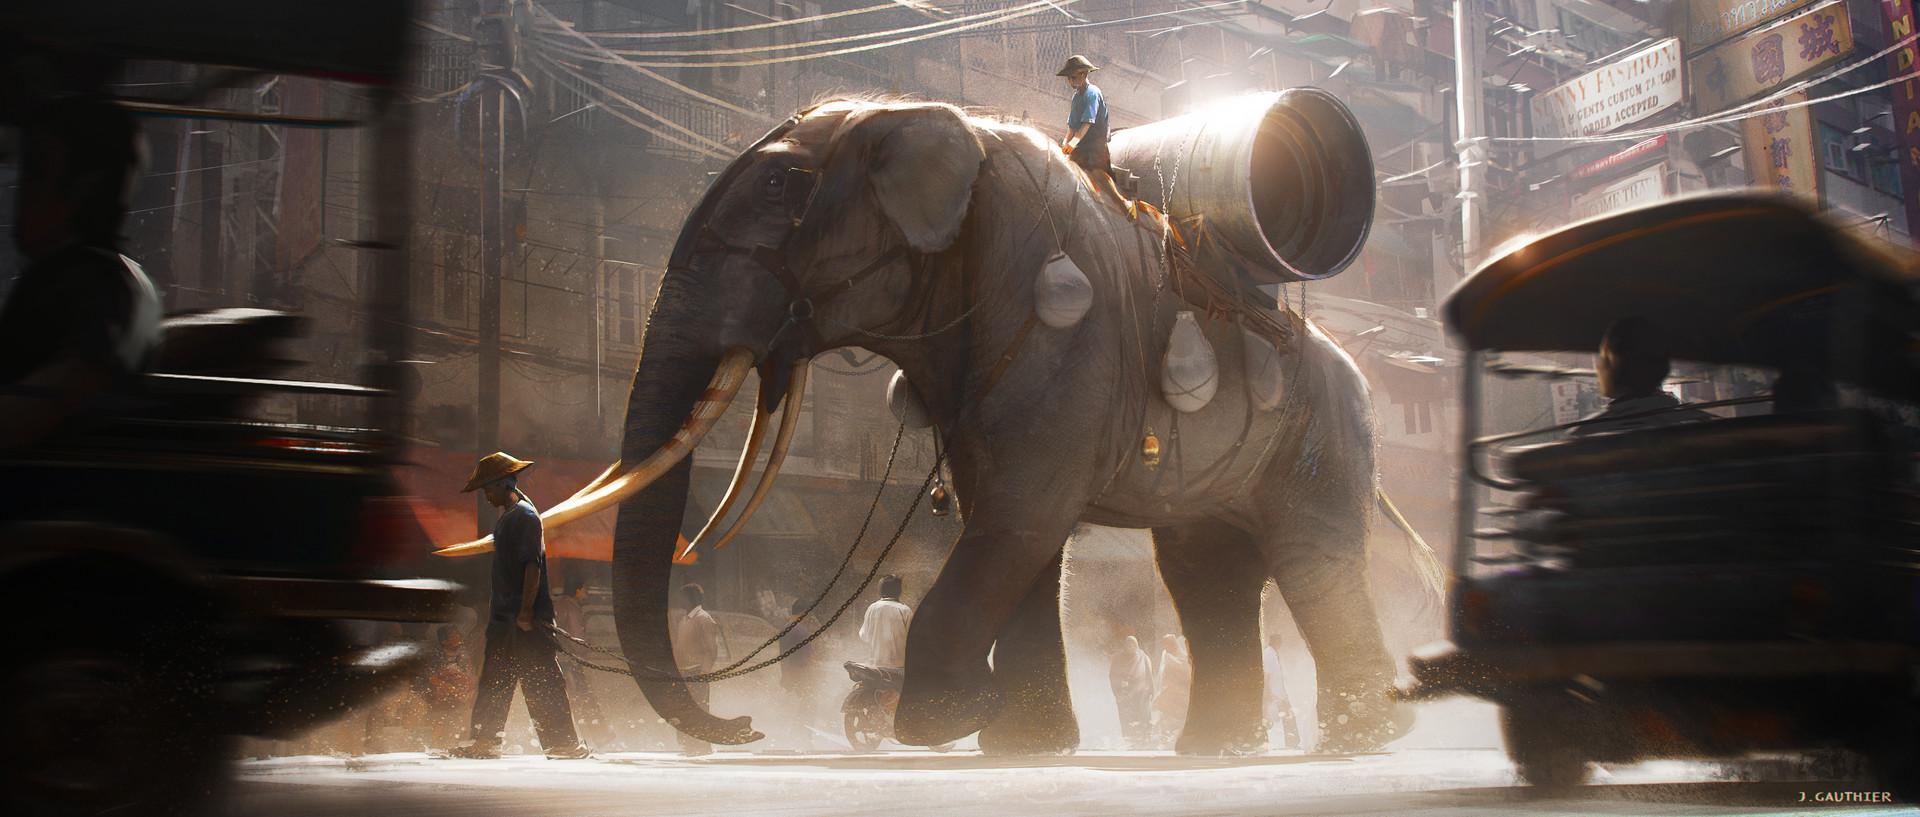 Julien gauthier bangkokxxiii 08 mastodonte street